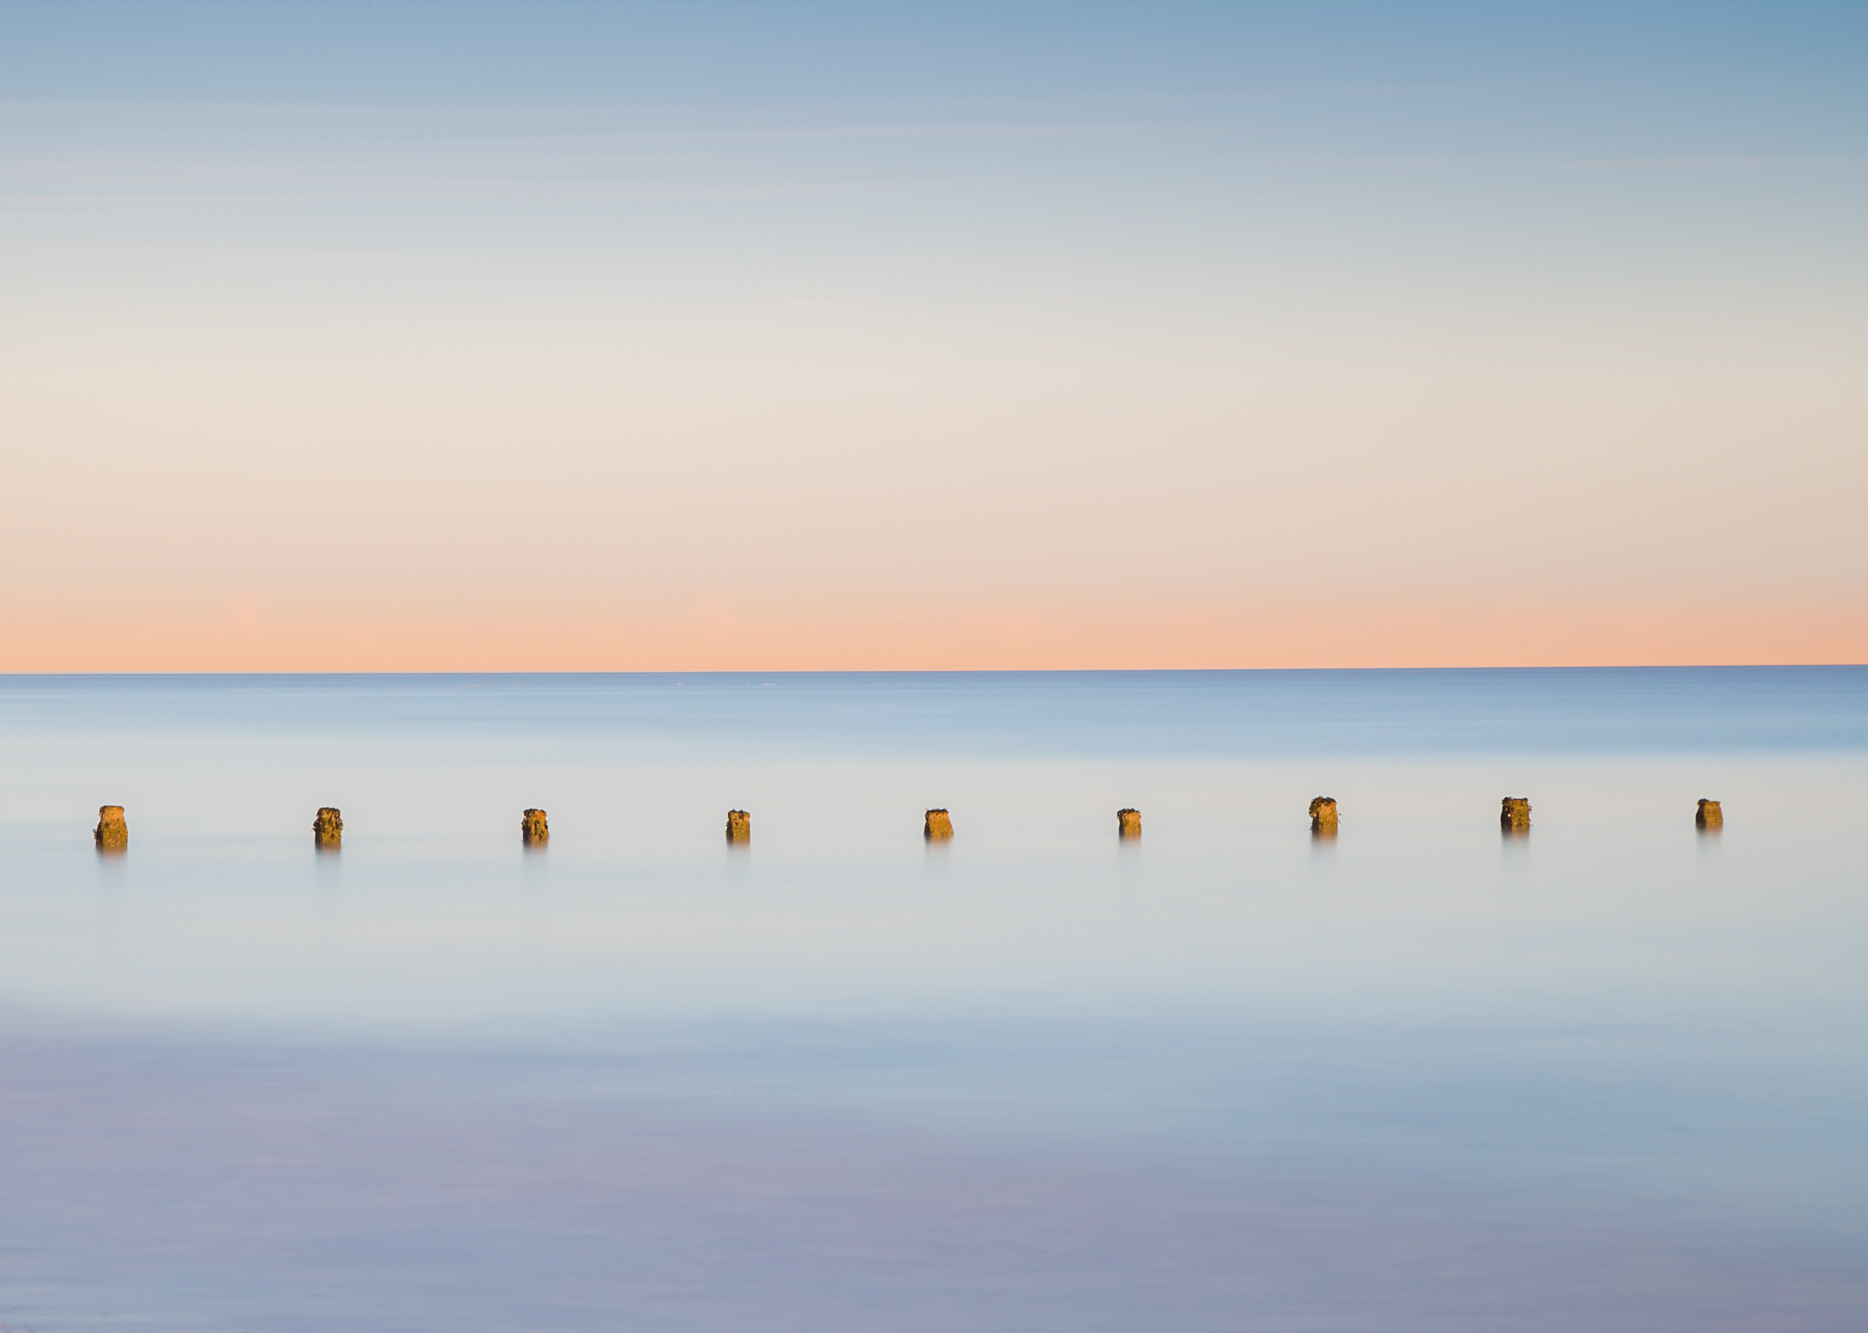 antonyz long exposure landscape minimal photograph of posts in the sea